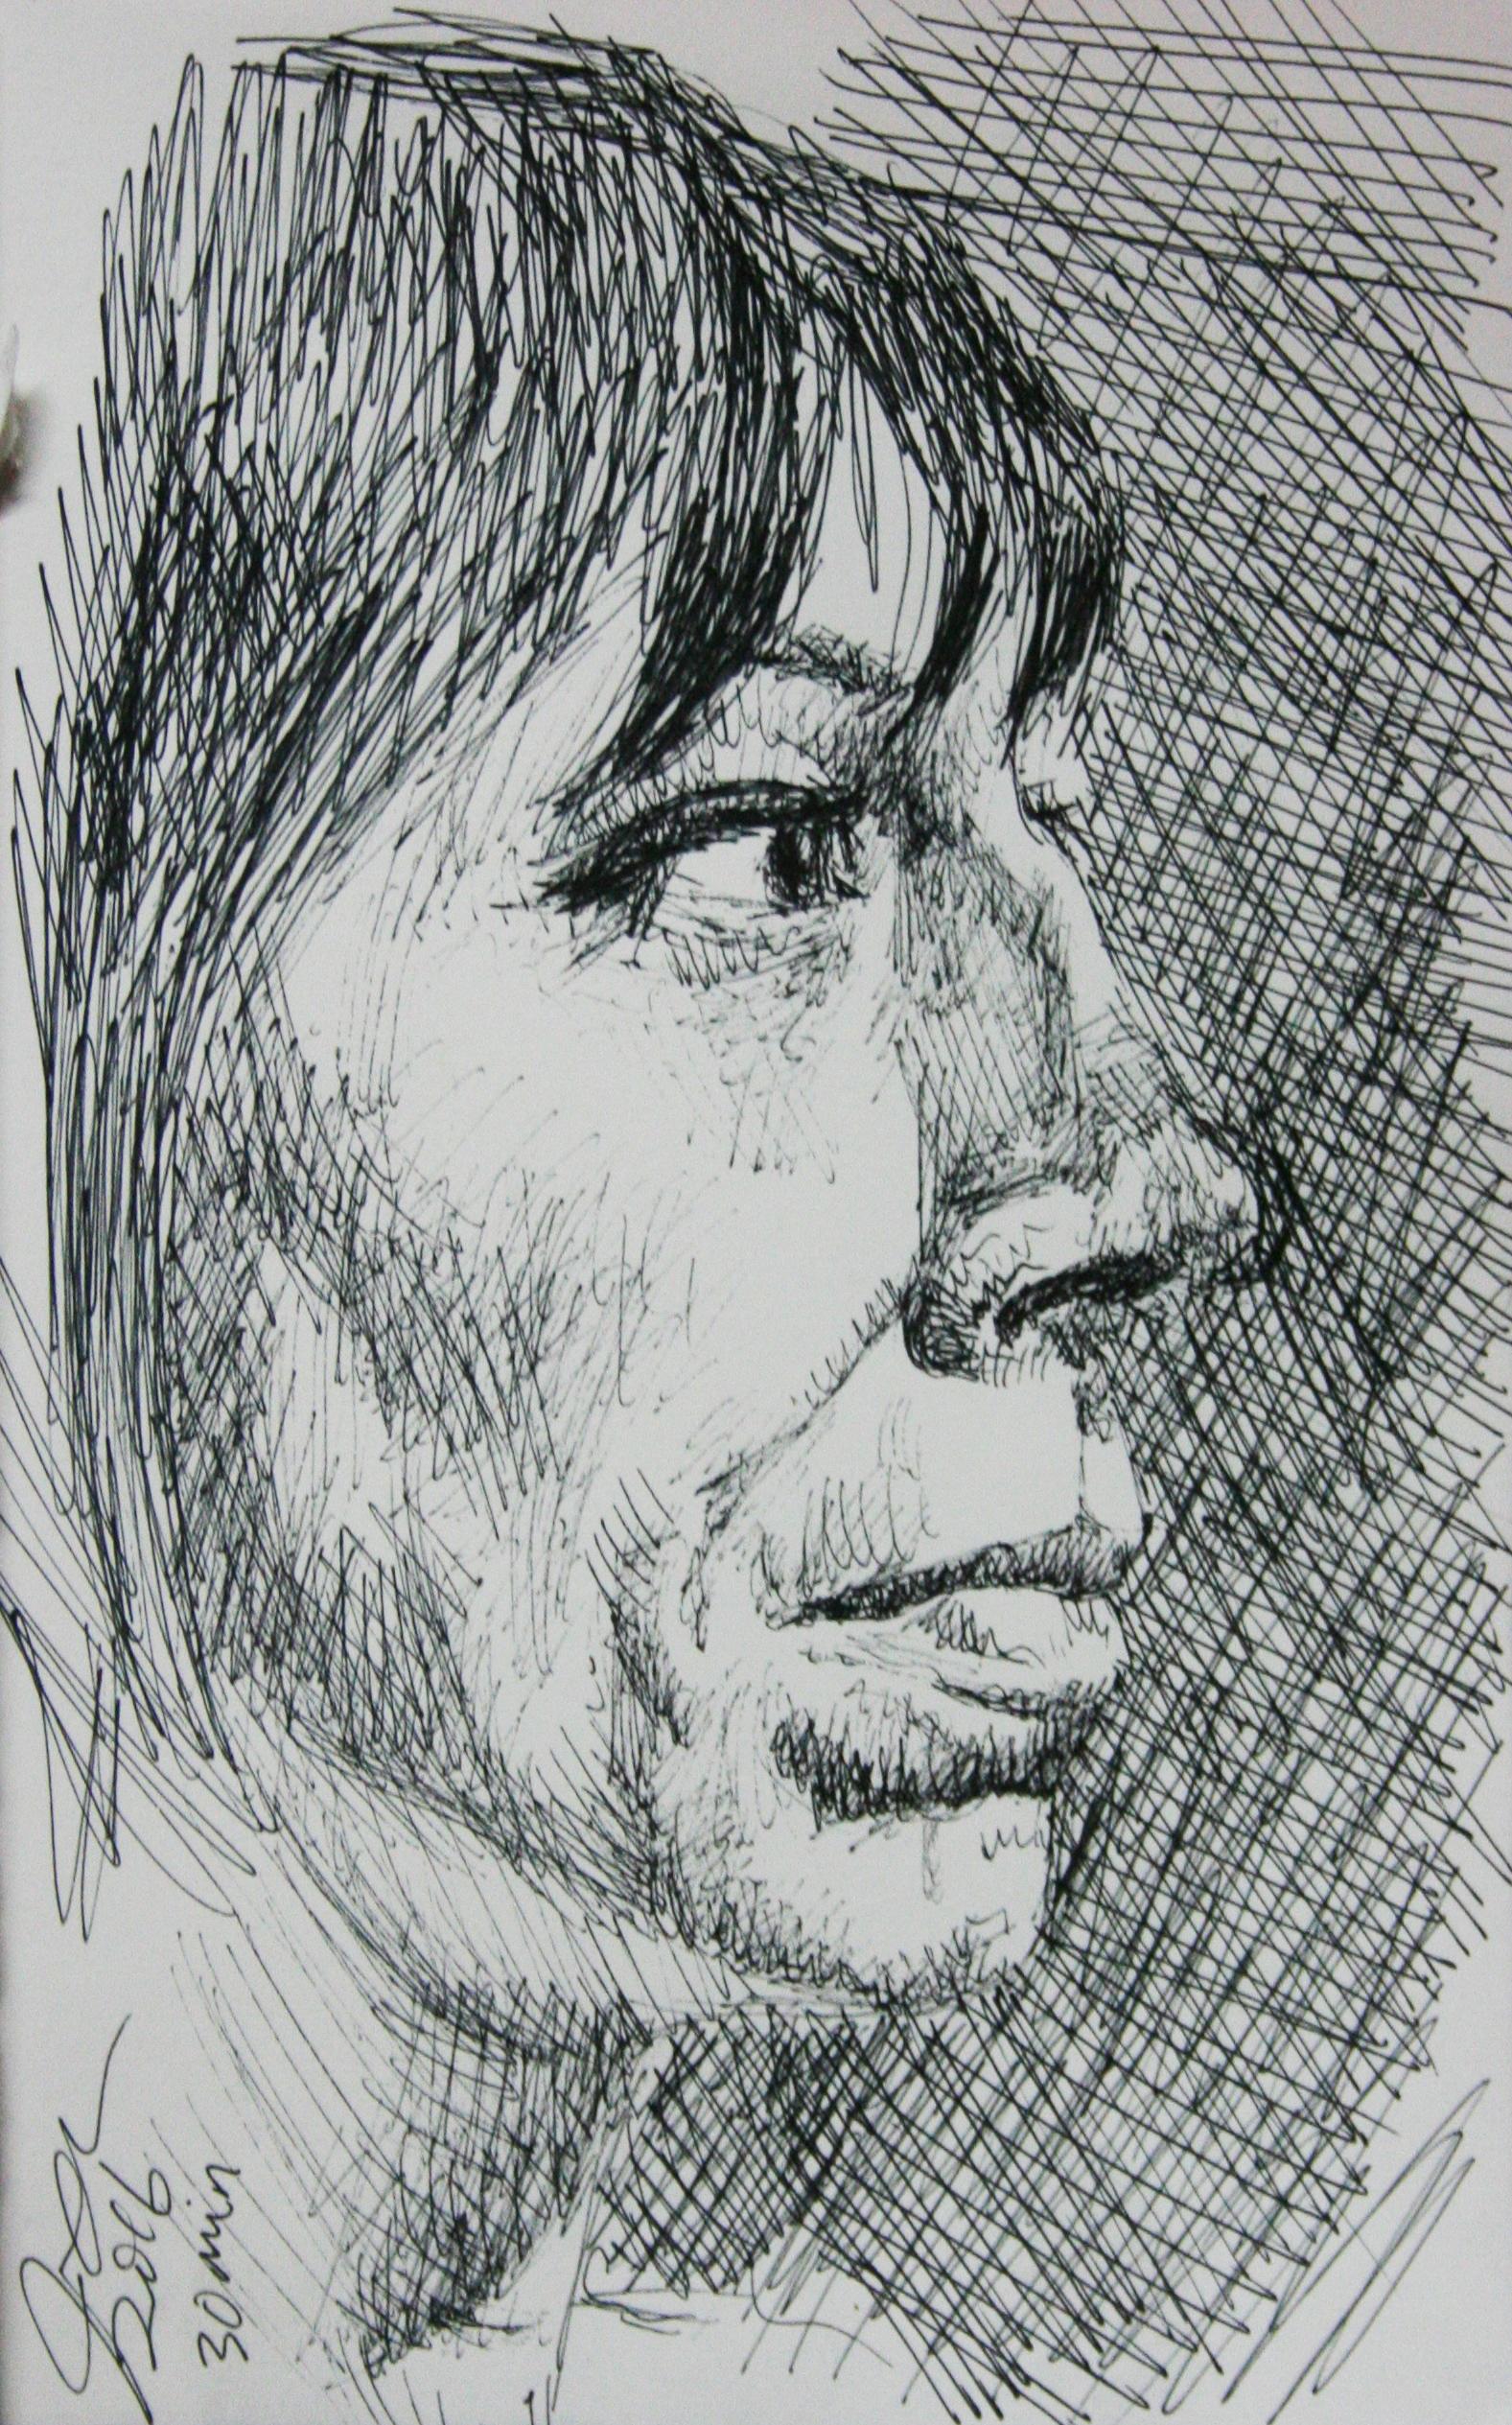 Jason K. Milburn did this hour drawing.